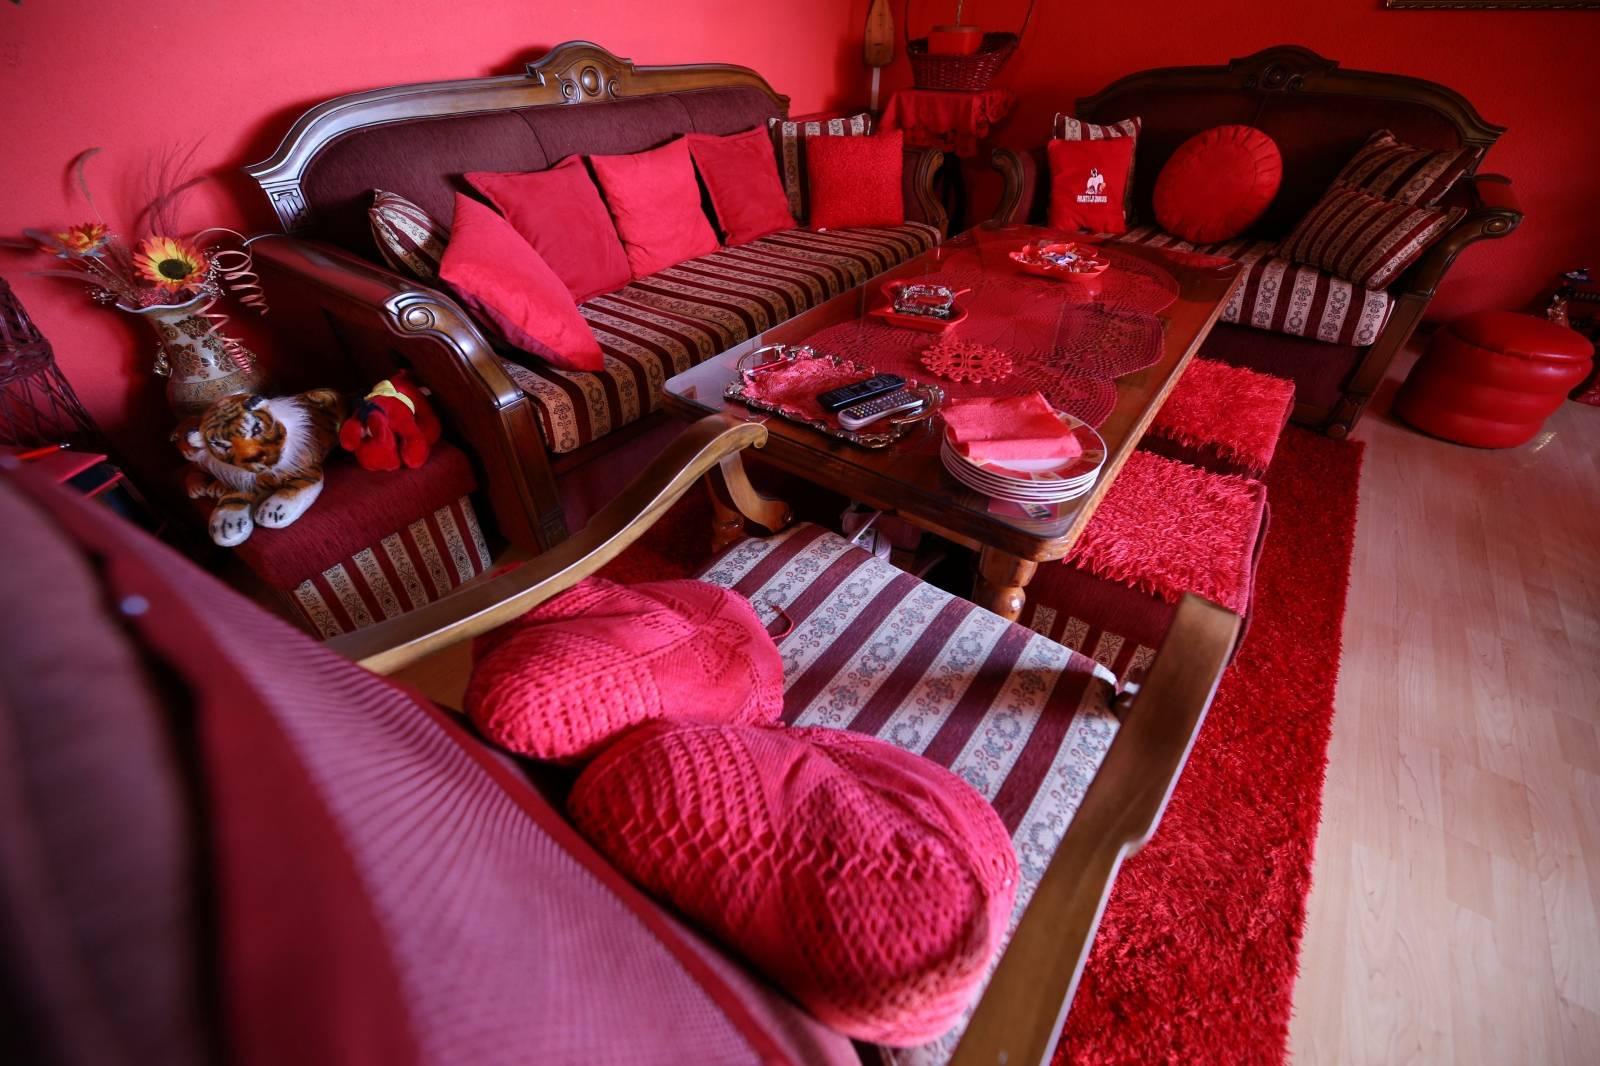 Zorica Rebernik's sitting room is seen in her house in the village of Breze near Tuzla